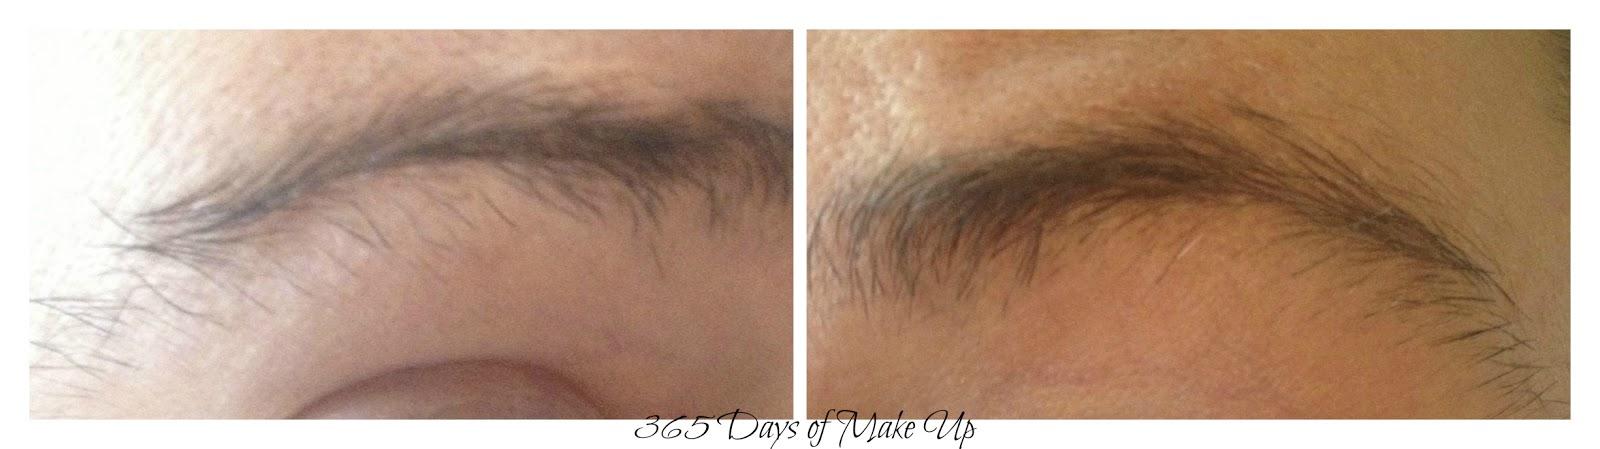 365 Days Of Make Up Day 124 Rapidbrow Eyebrow Enhancing Serum